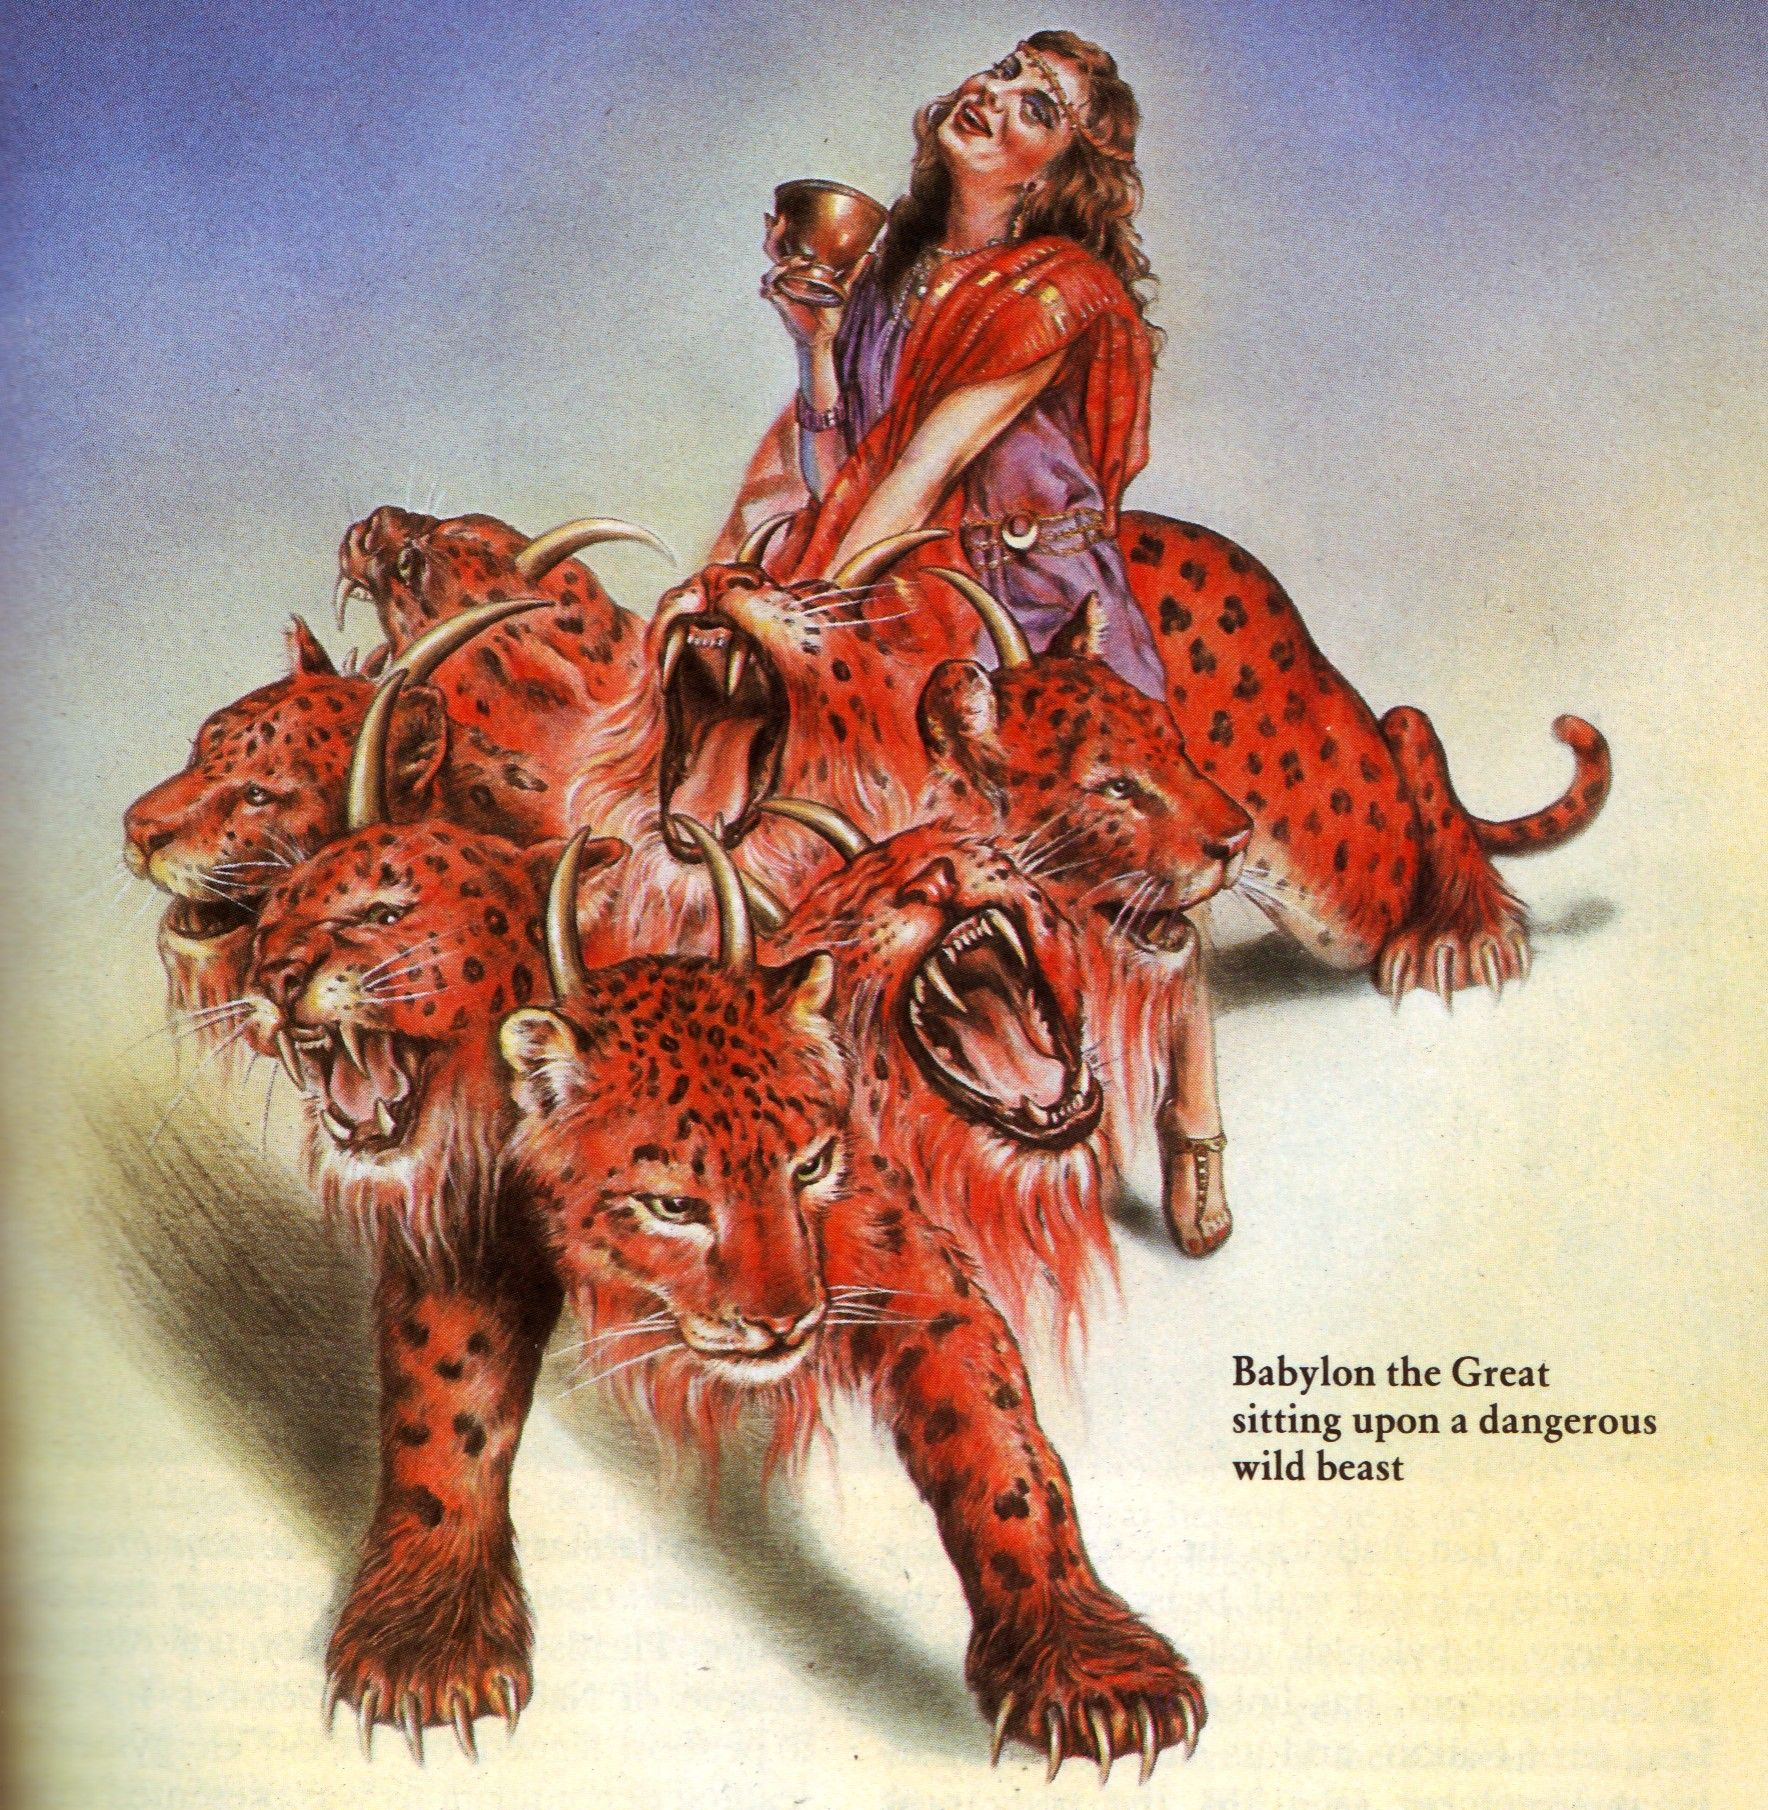 babylon the Great on her many-headed beast